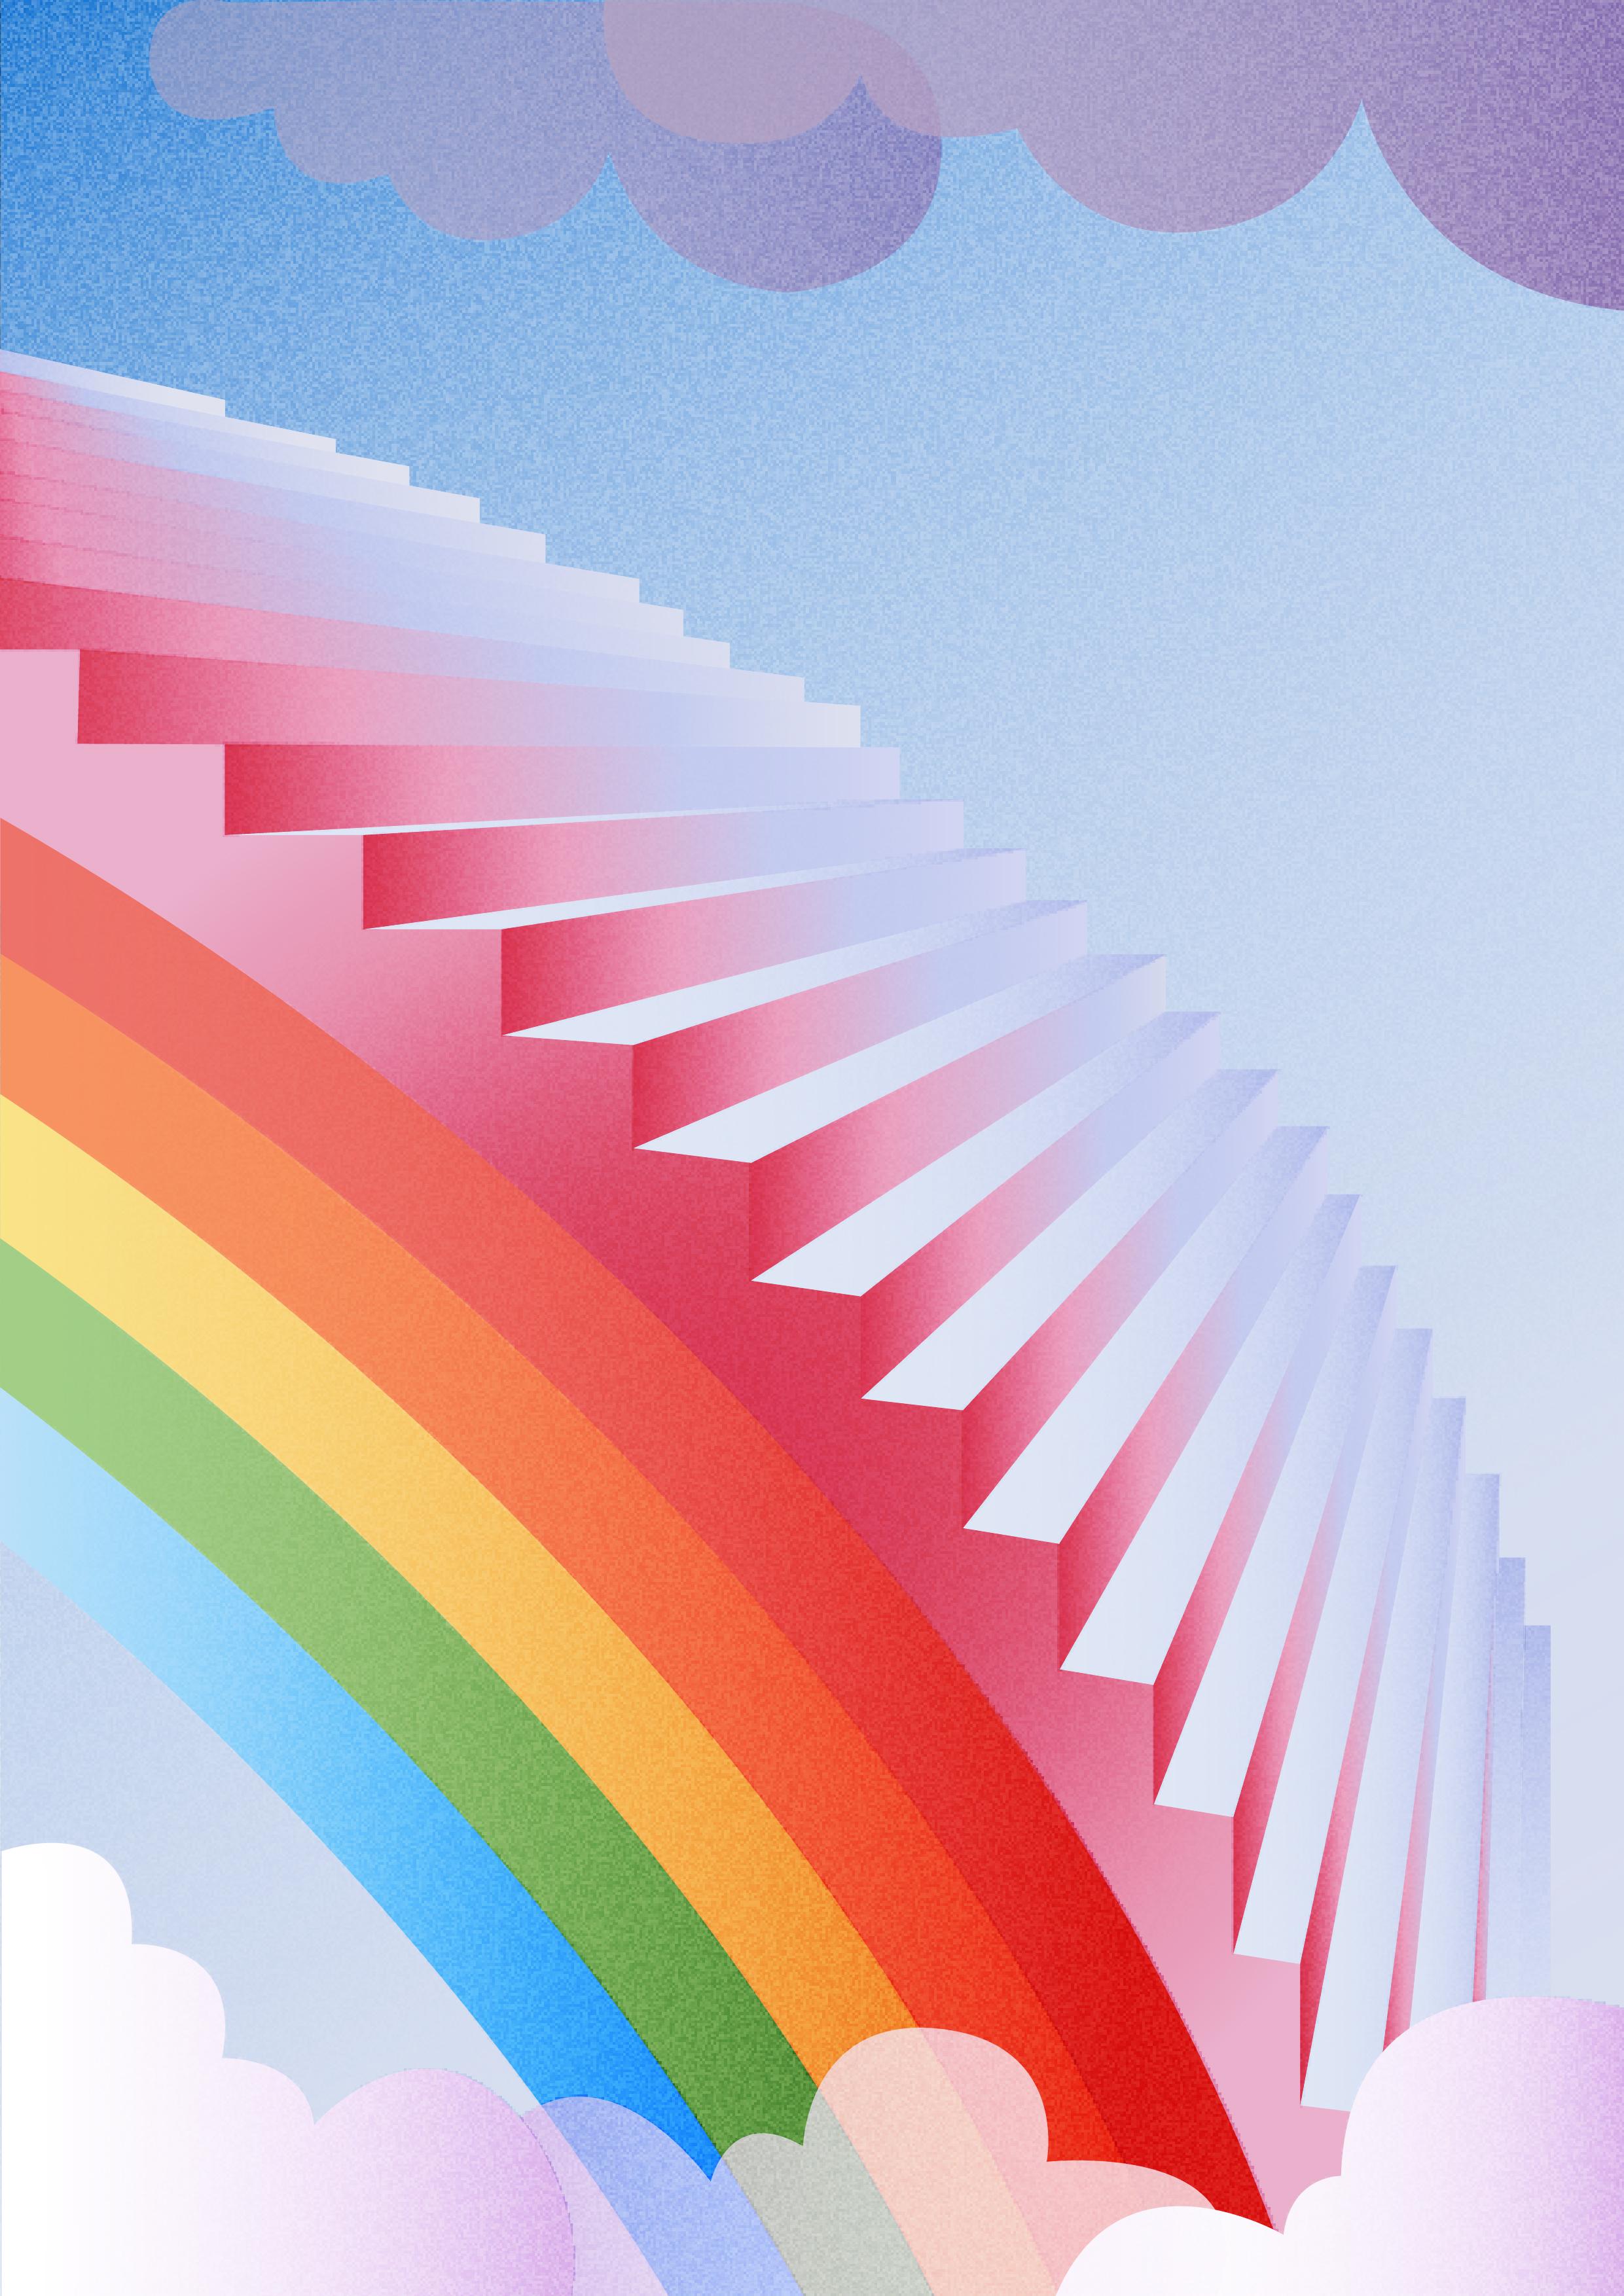 scala arcobaleno